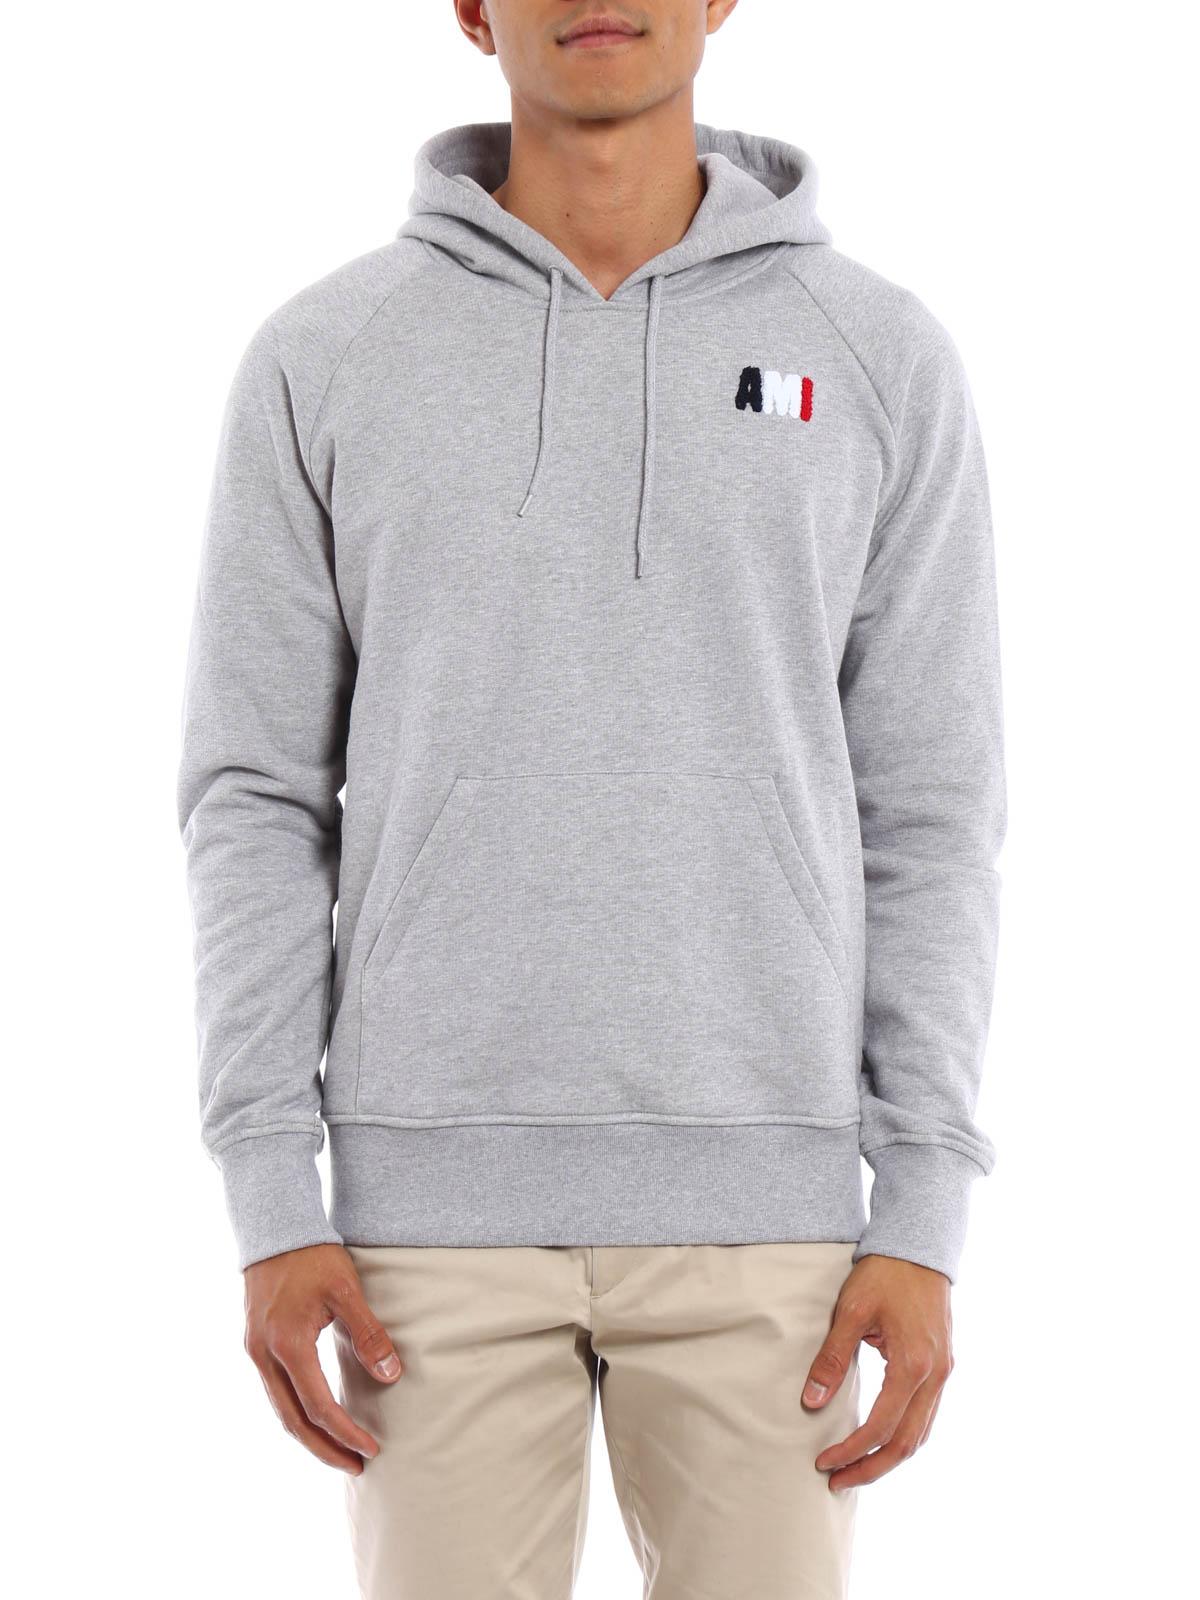 Cotton hooded sweatshirt by Ami Alexandre Mattiussi - Sweatshirts ...